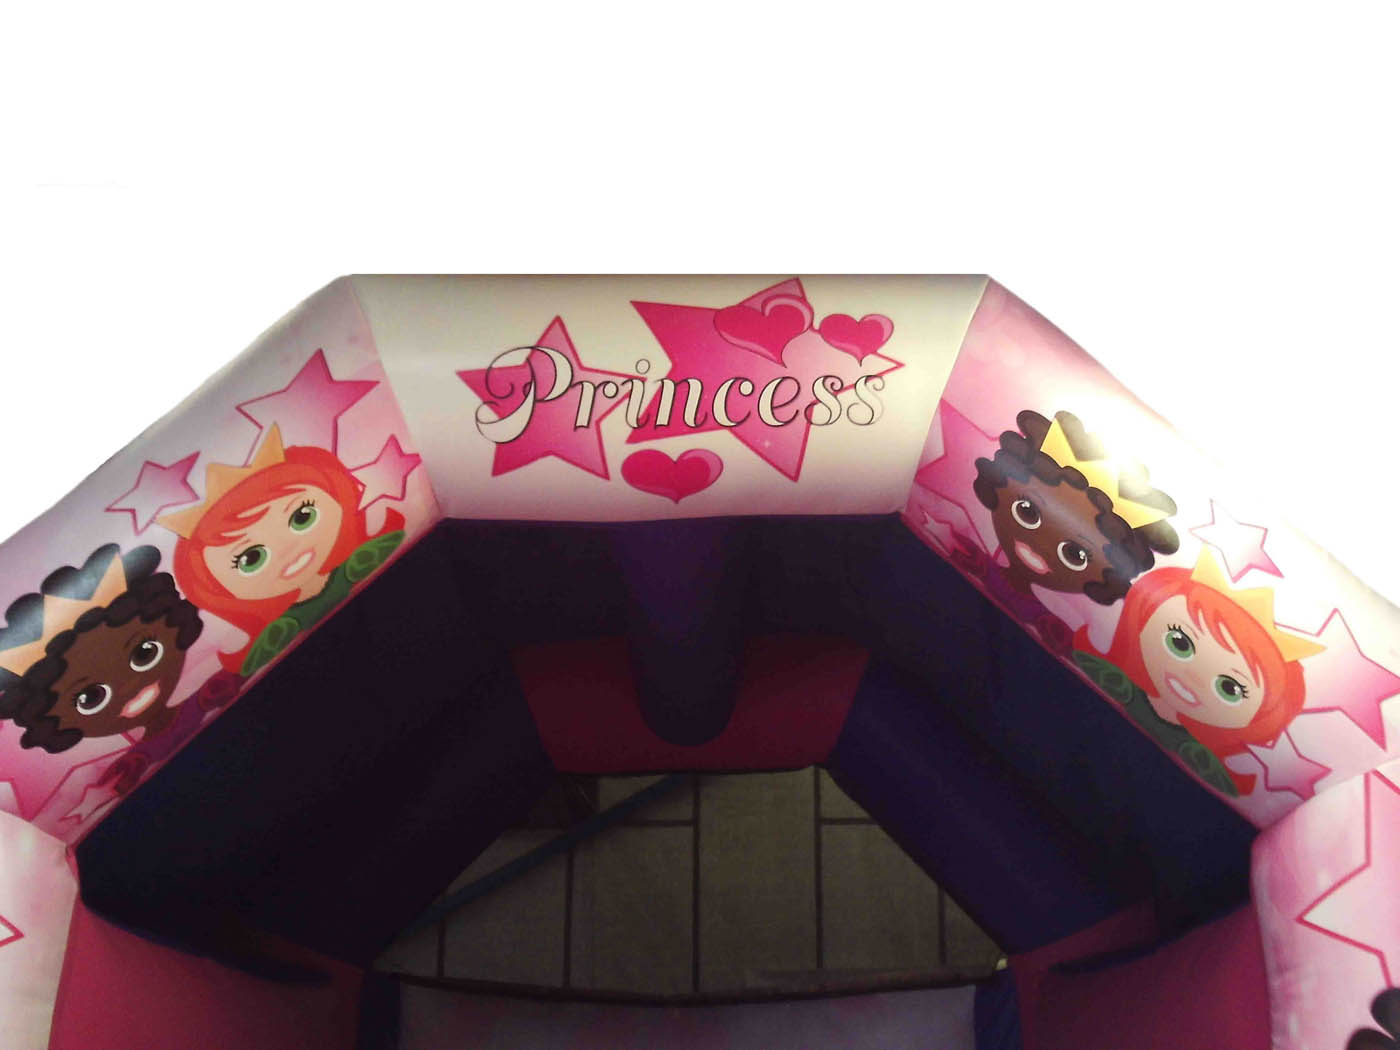 Princess Themed Artwork